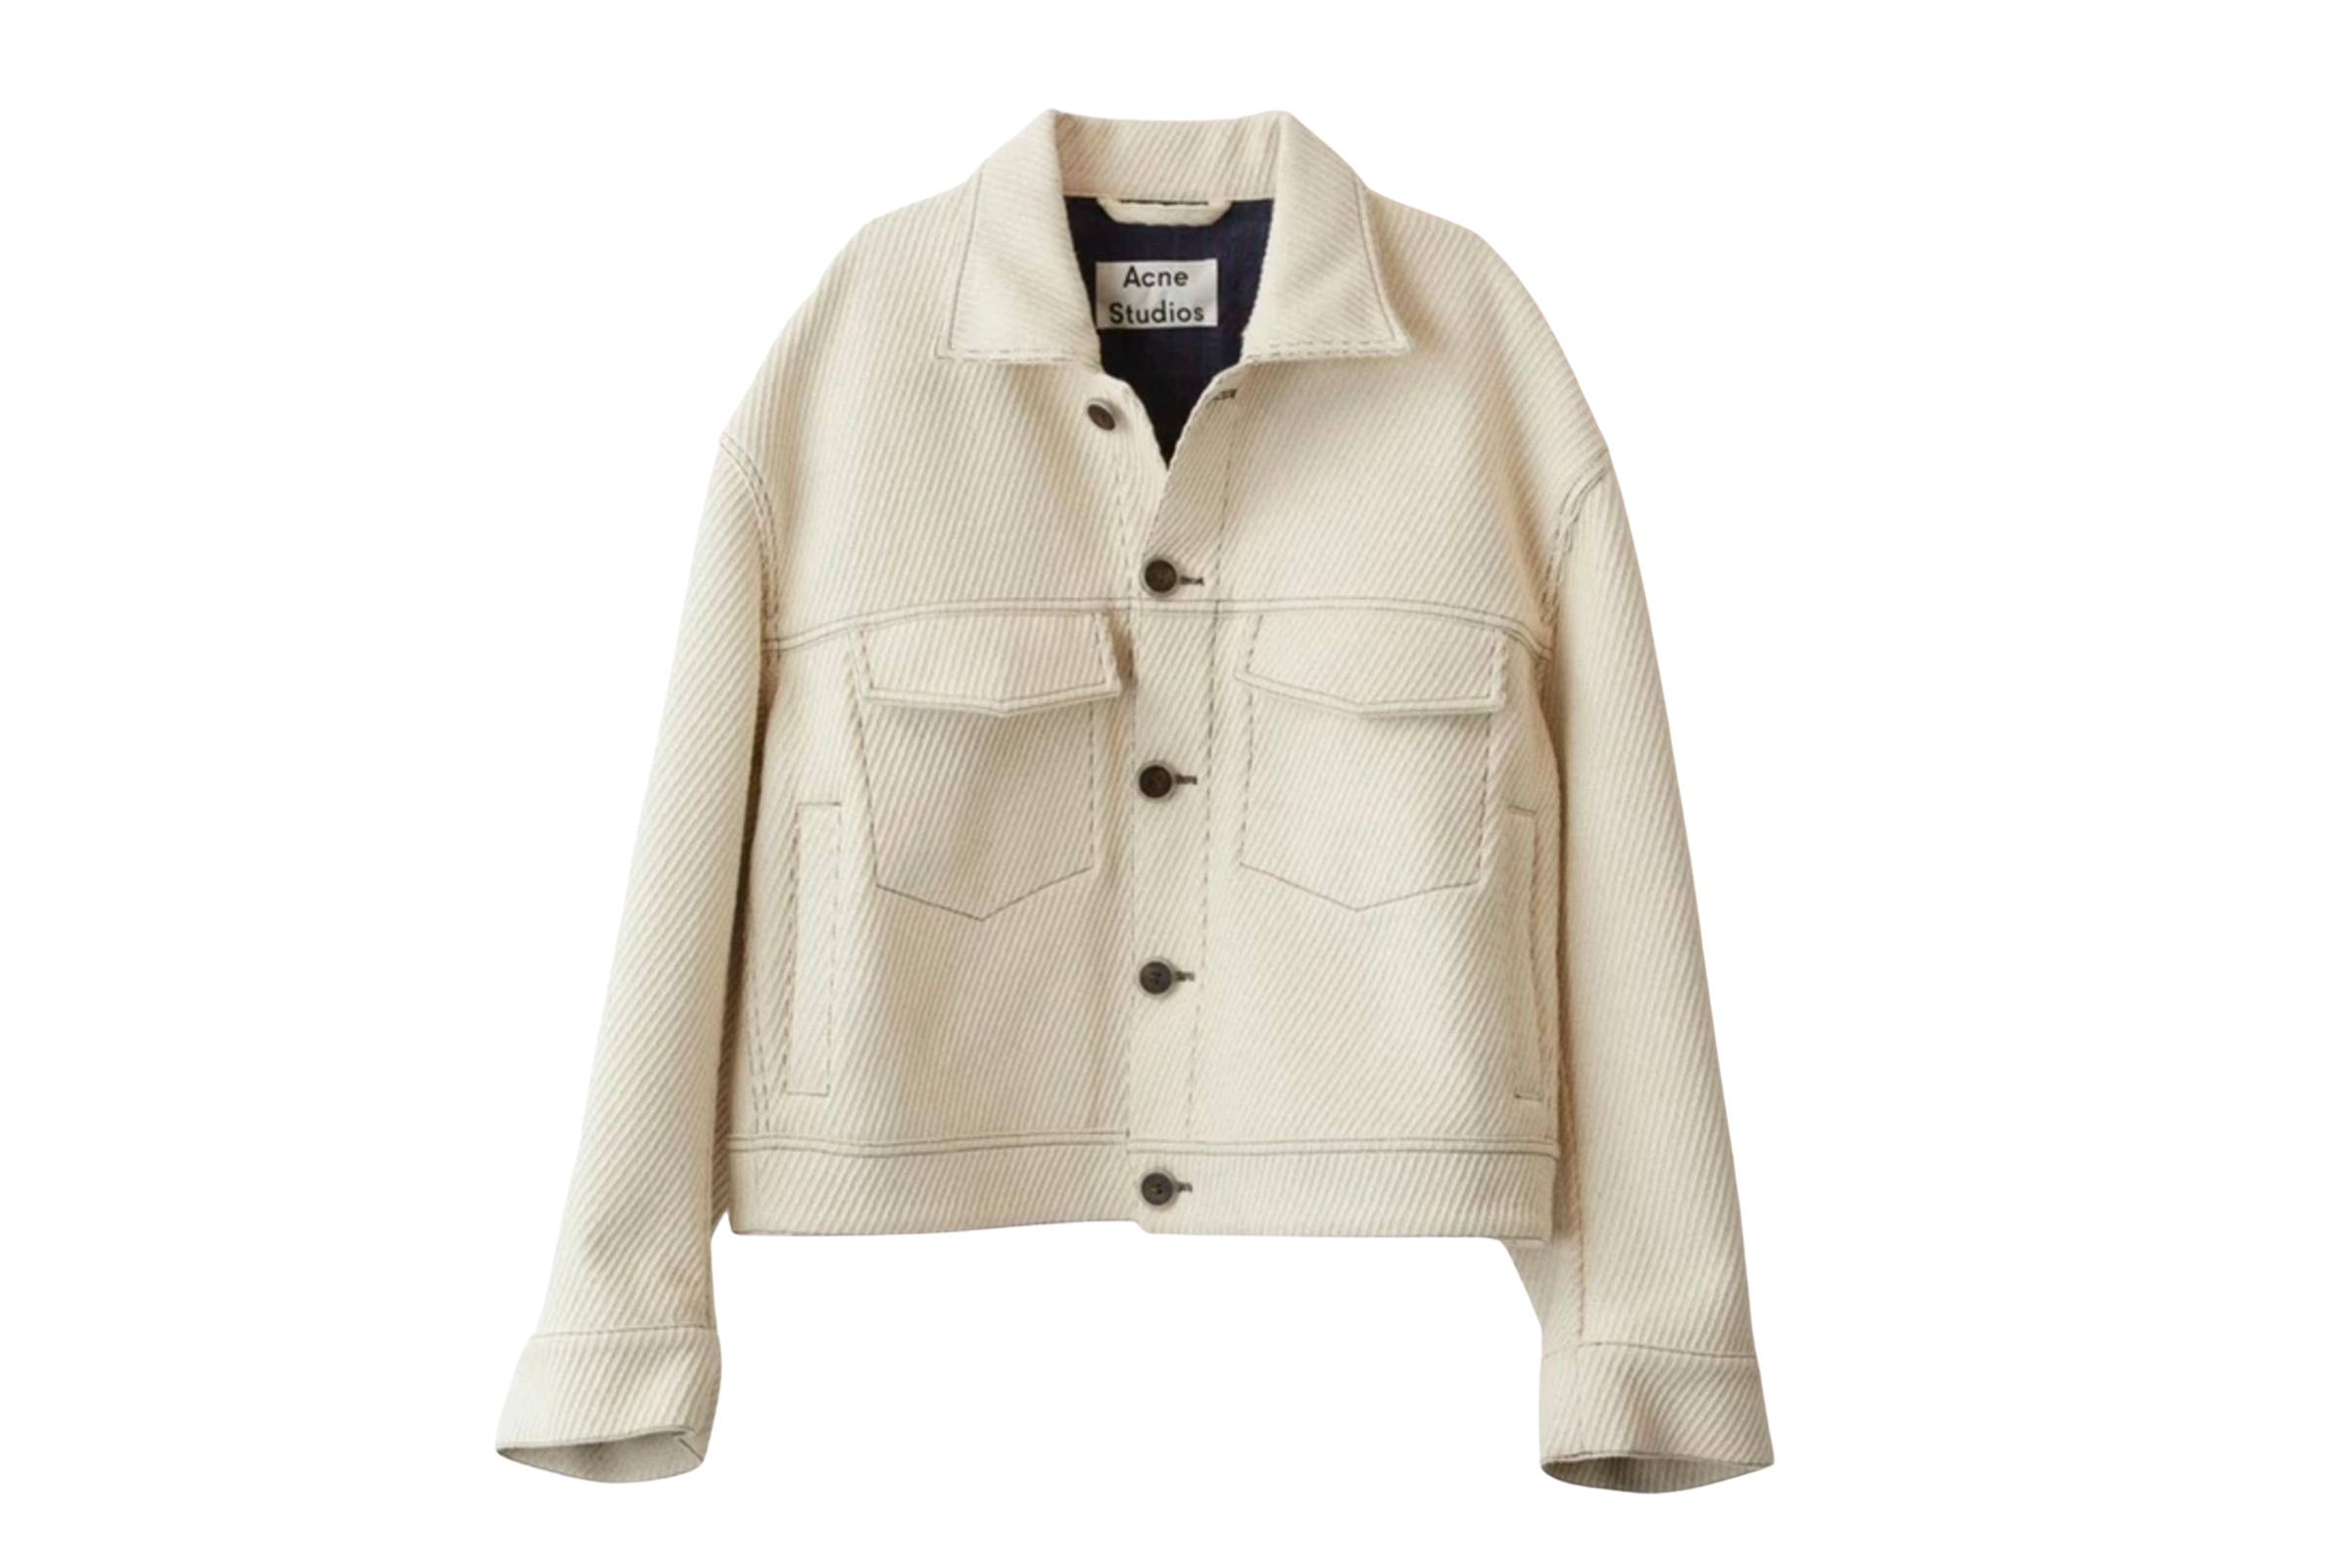 Acne Studios Cropped Jacket